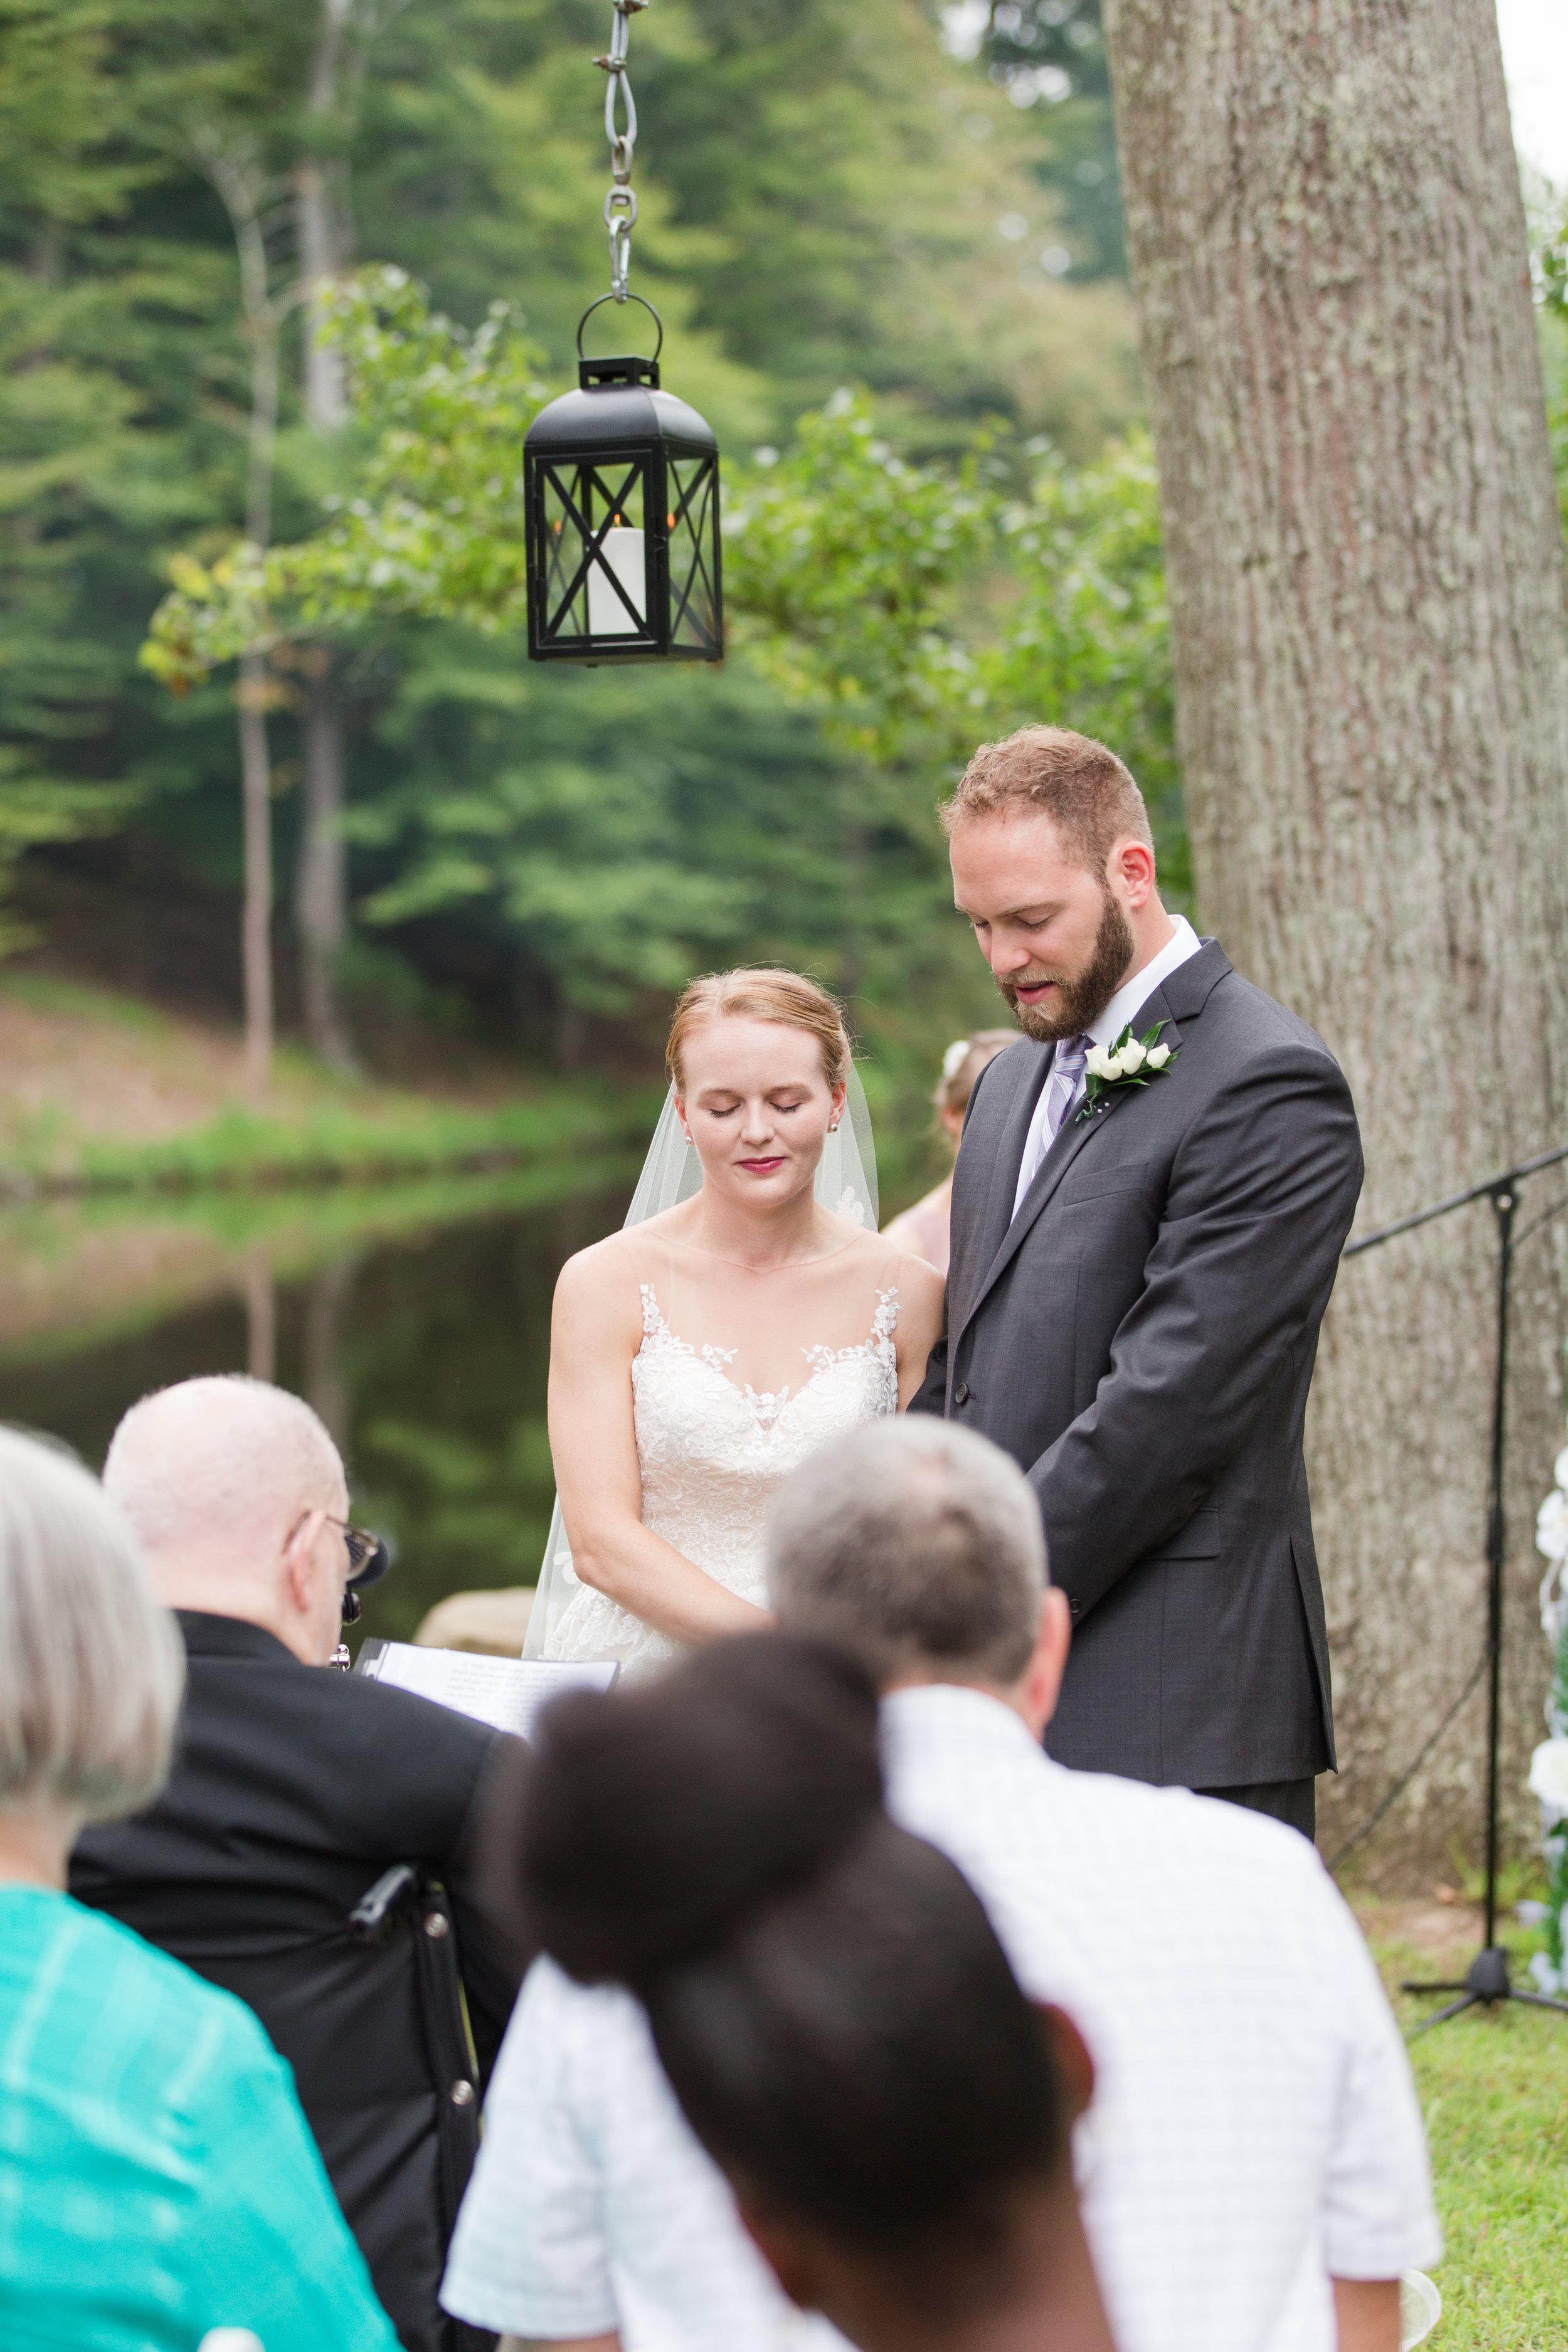 Garton-Demarco Wedding-Ceremony -137.jpg